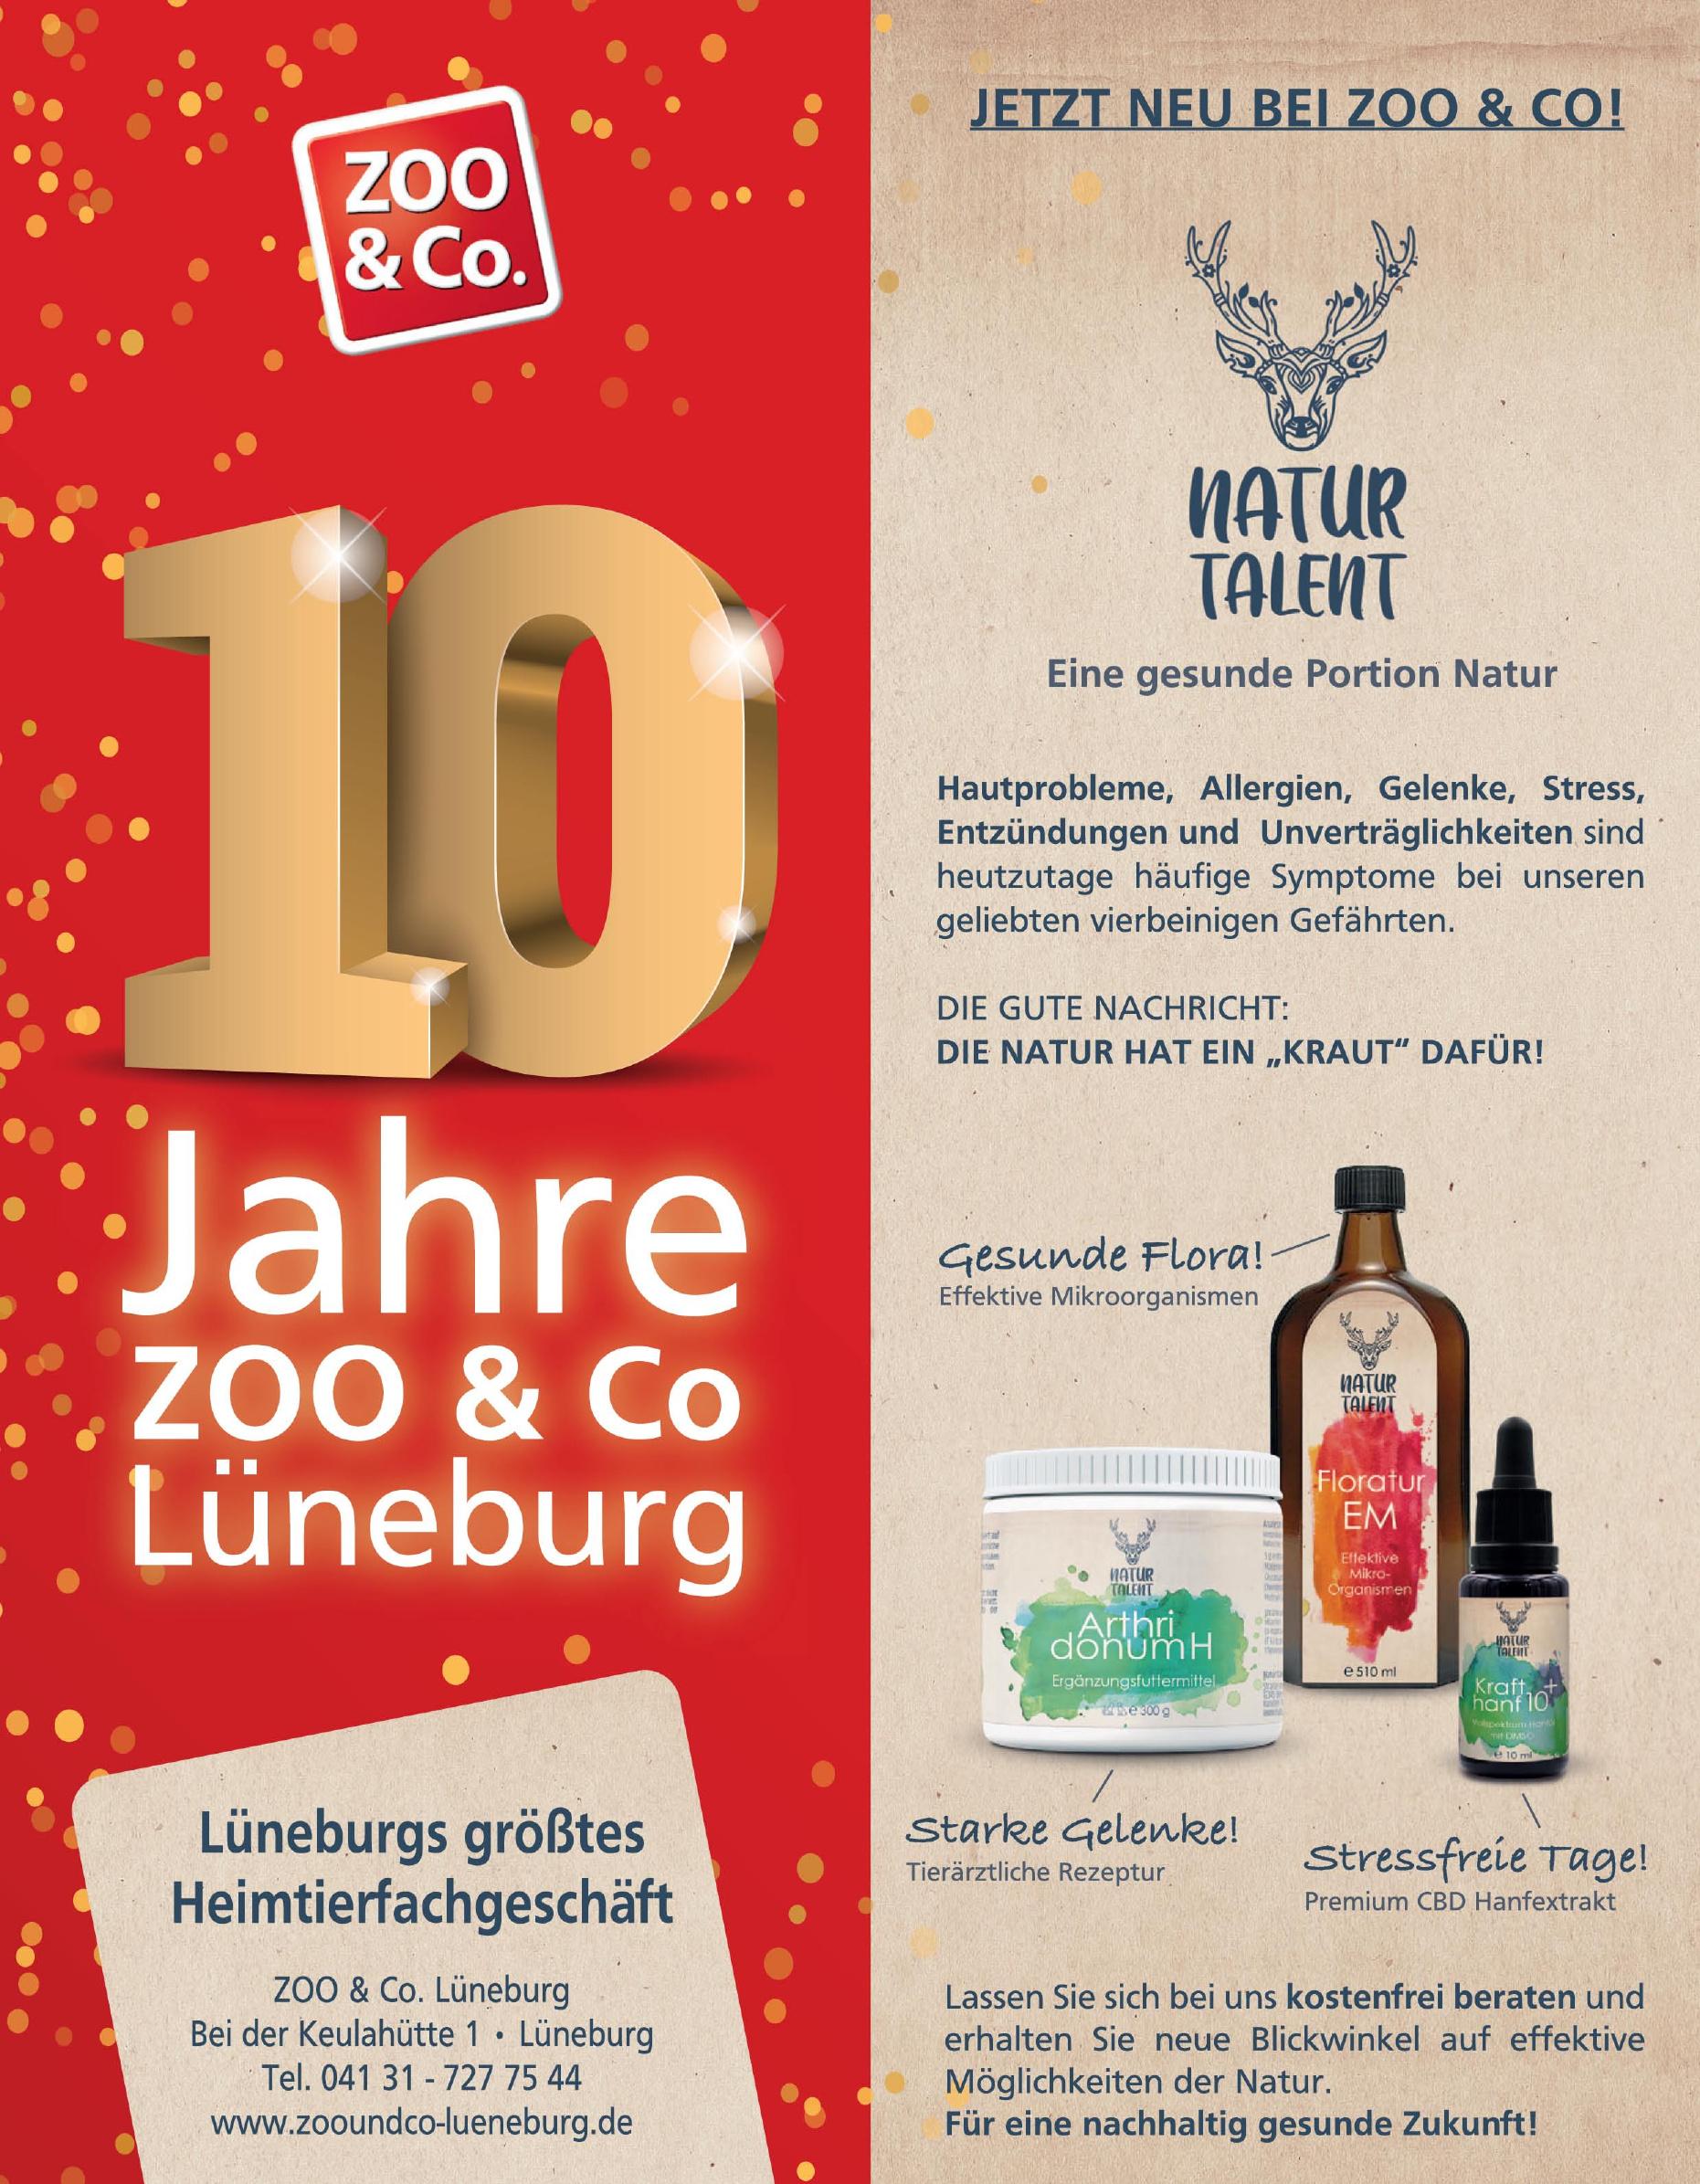 Zoo & Co. Lüneburg